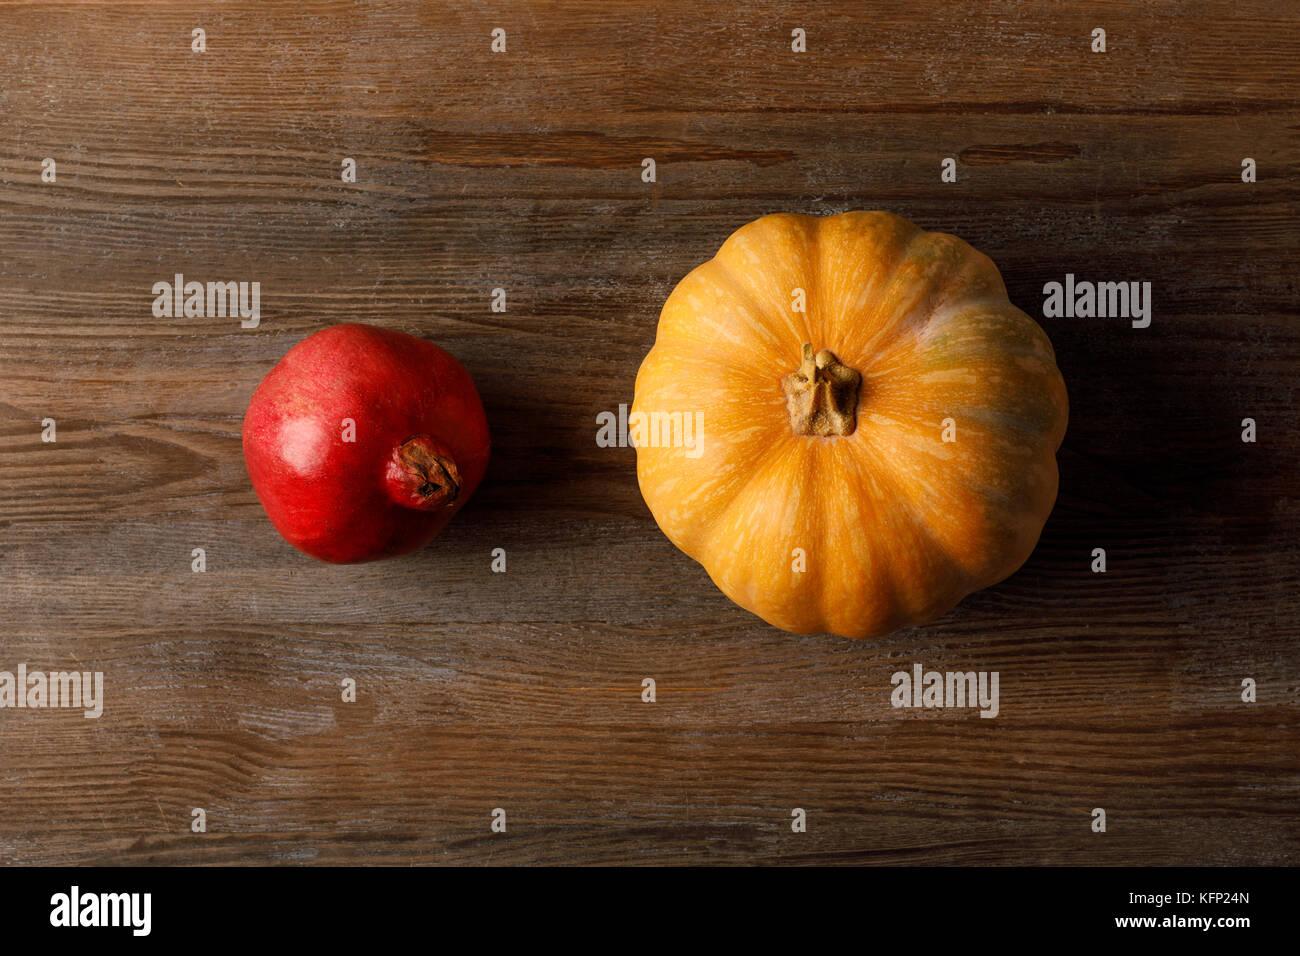 seasonal pomegranate and pumpkin - Stock Image